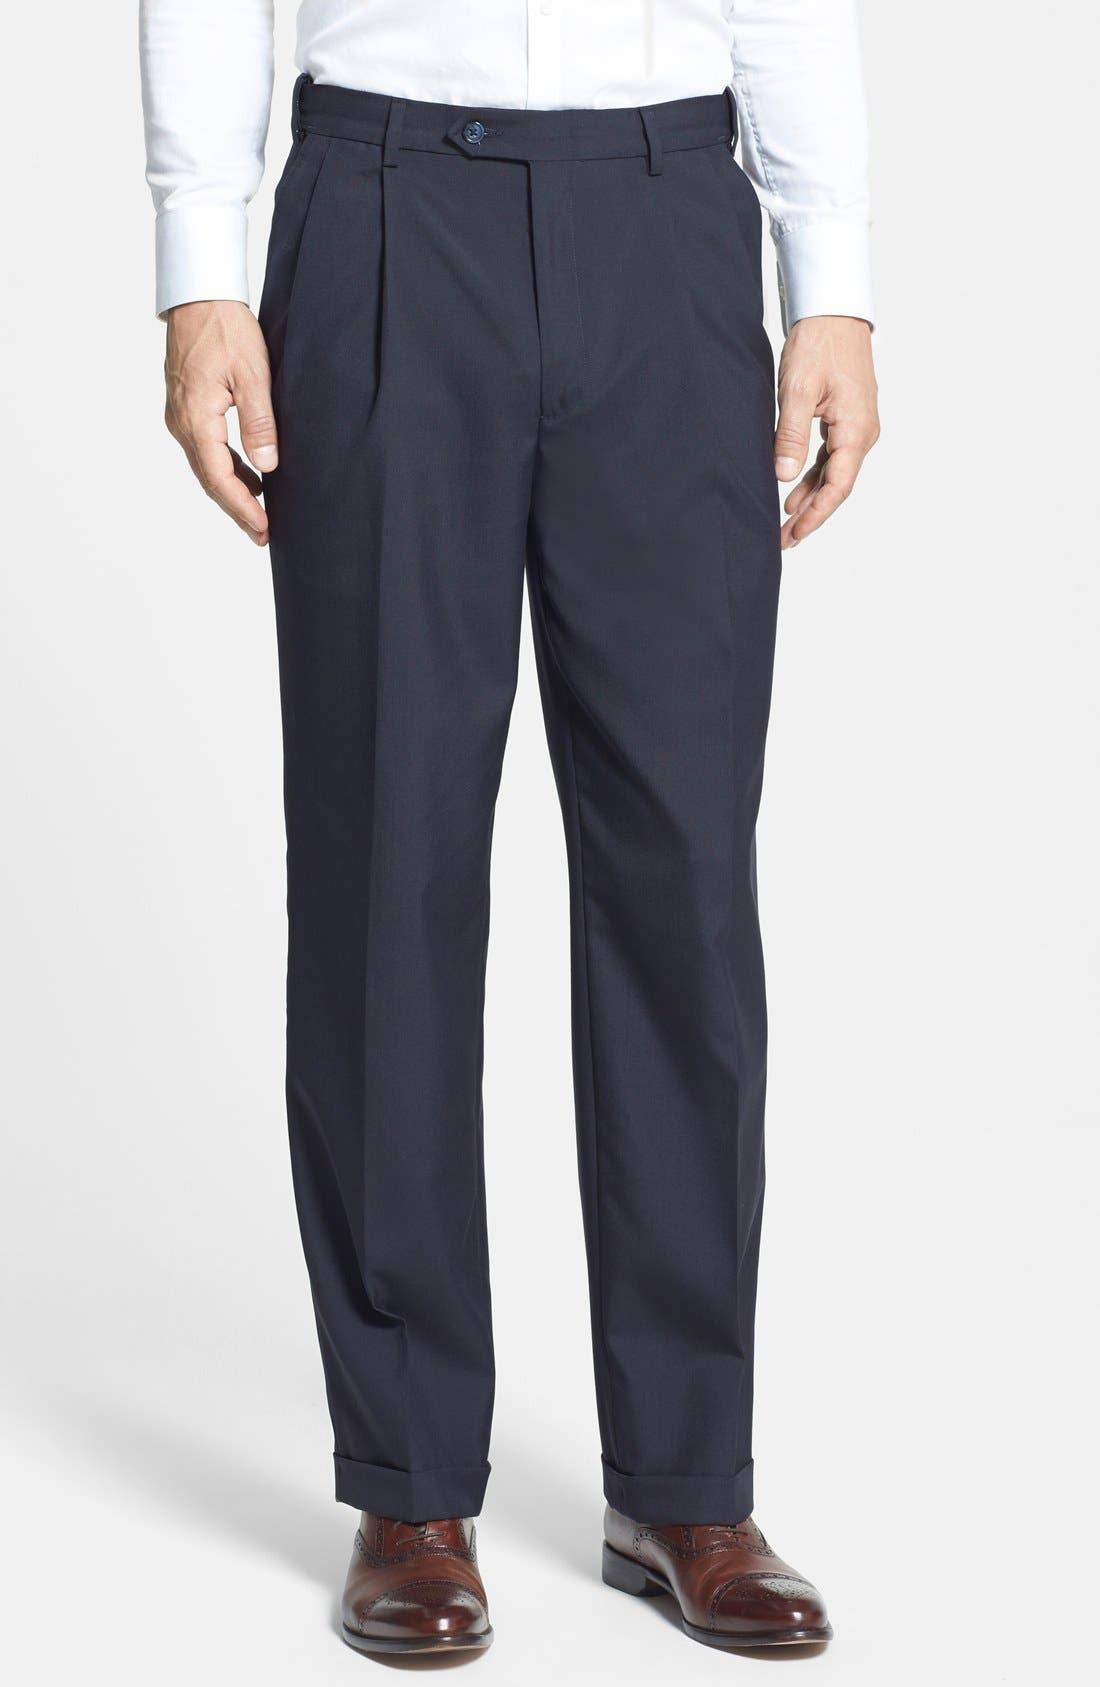 Berle Self Sizer Waist Pleated Trousers